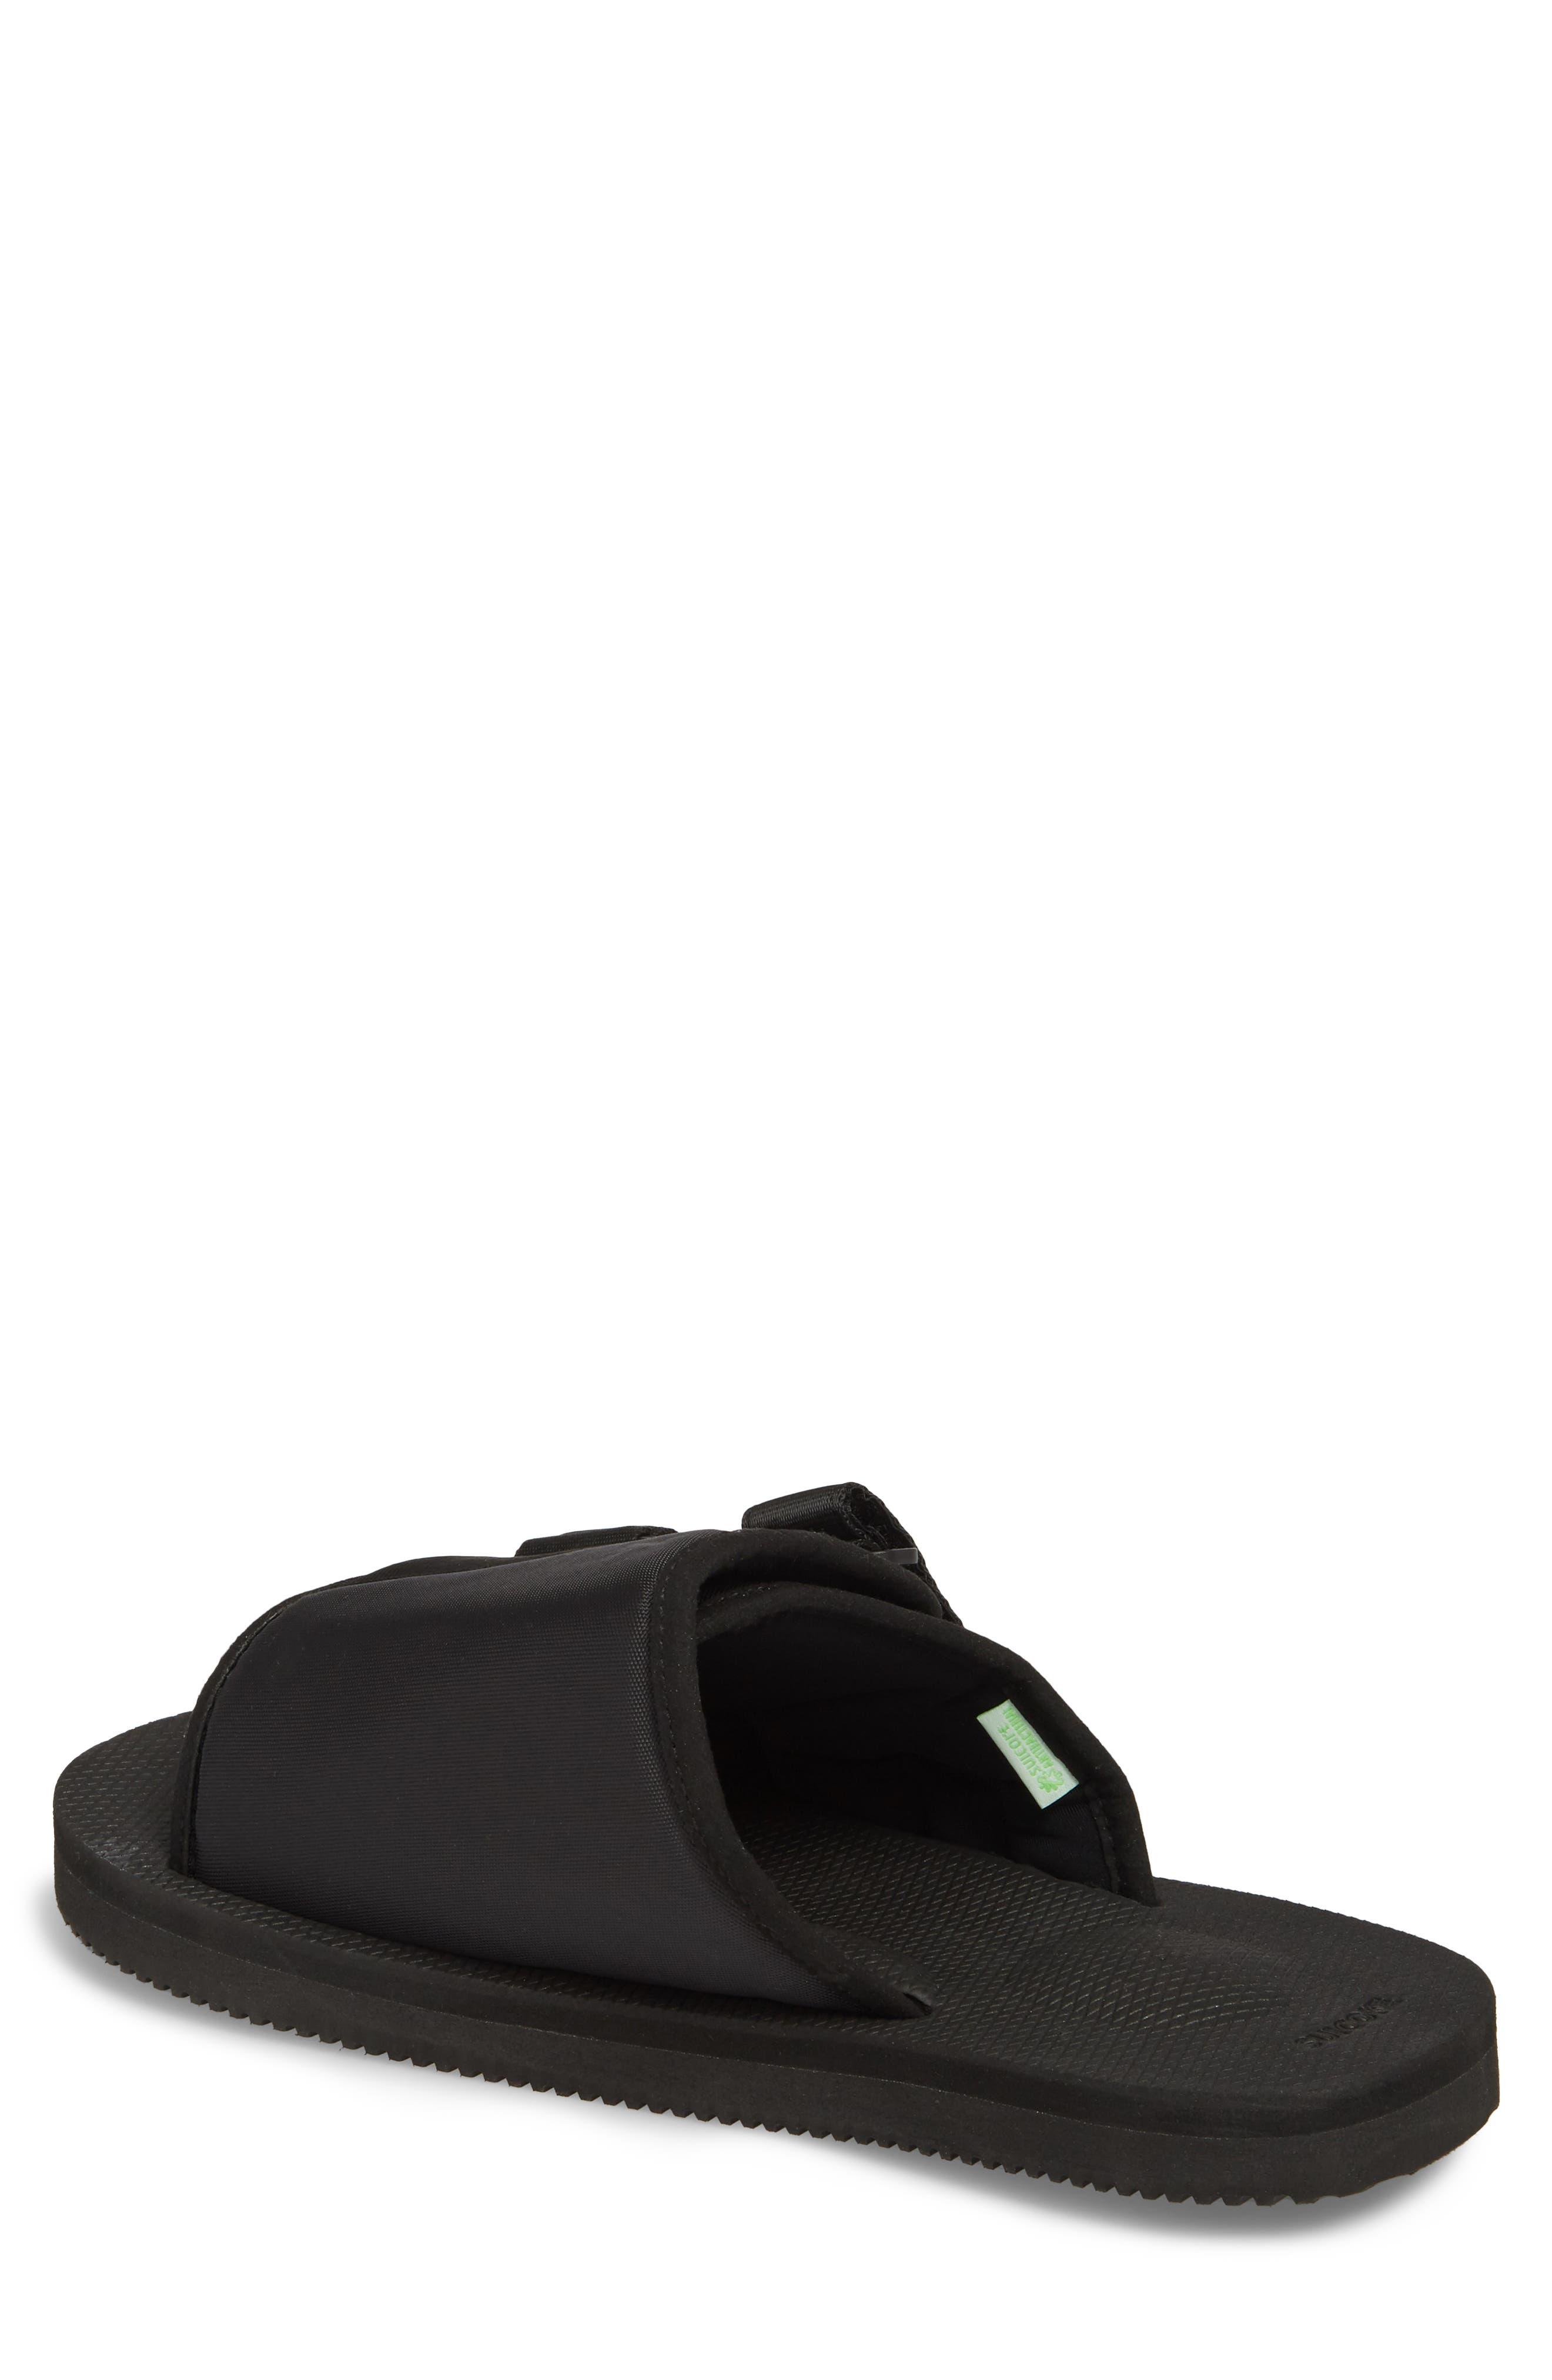 Kaw Cab Slide Sandal,                             Alternate thumbnail 2, color,                             BLACK